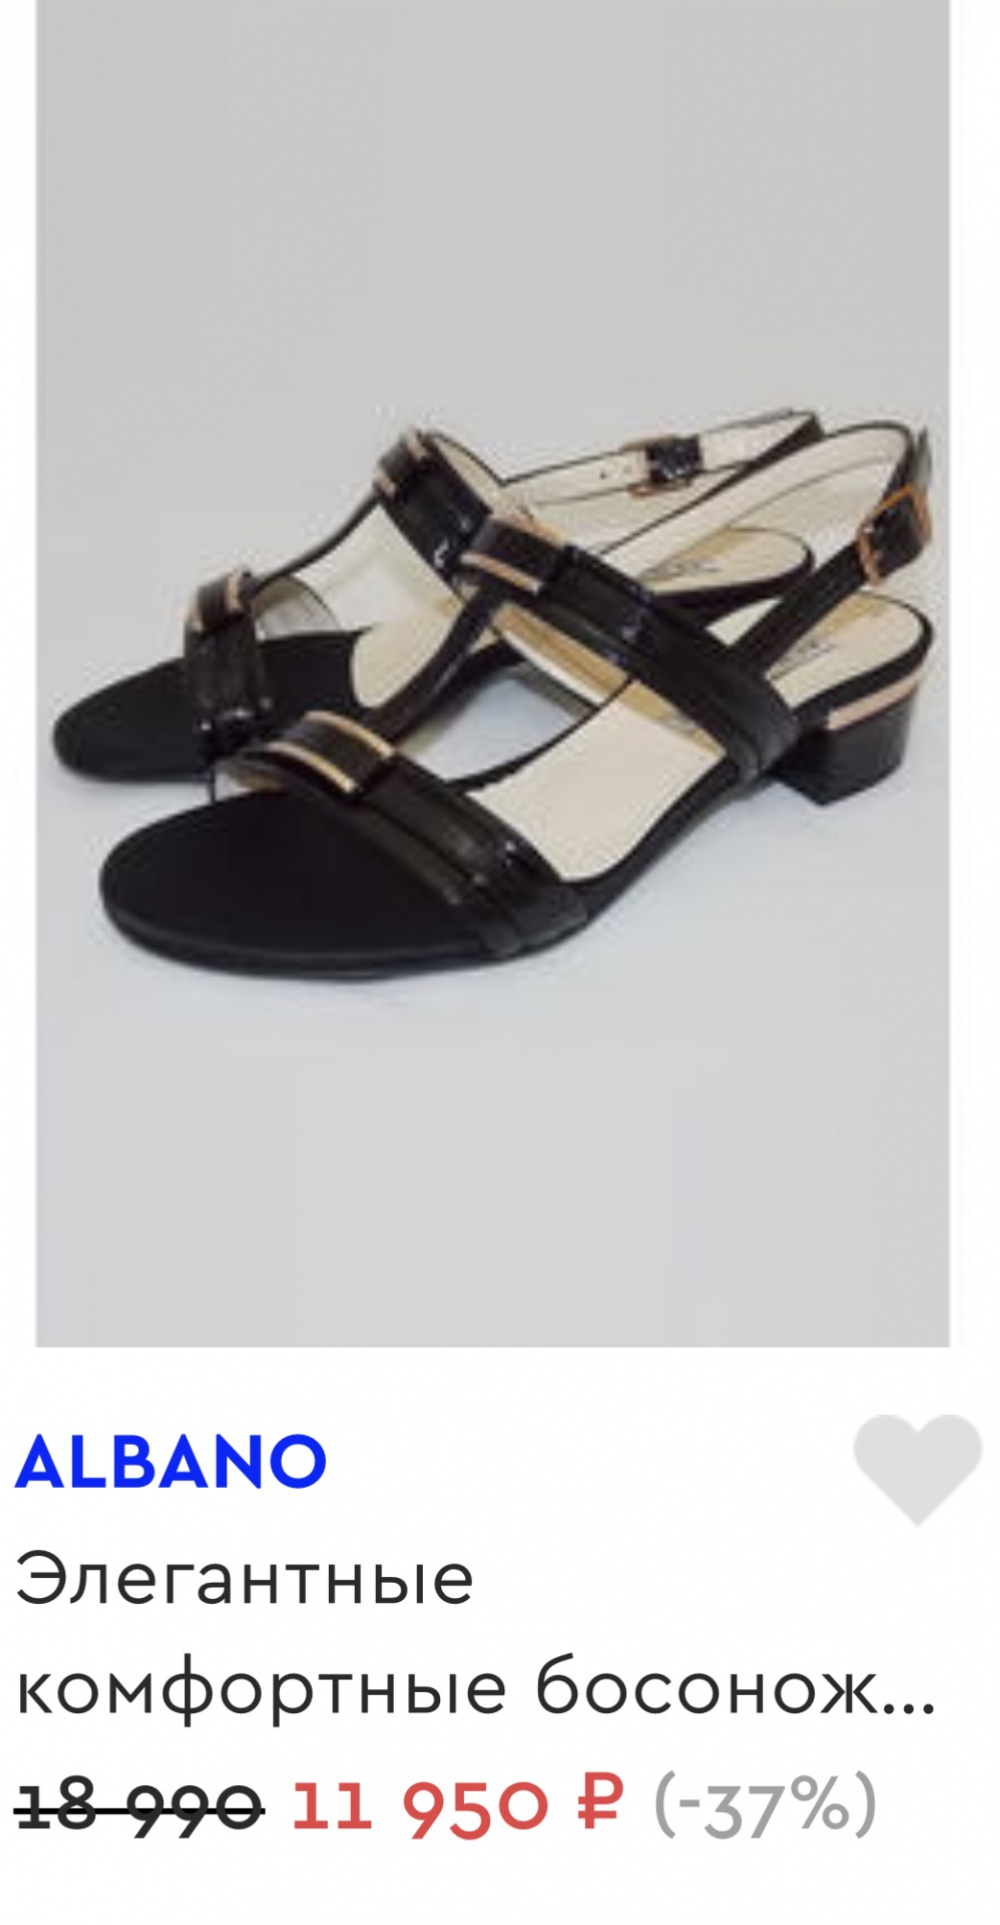 Сандалии / босоножки Albano, 38 р